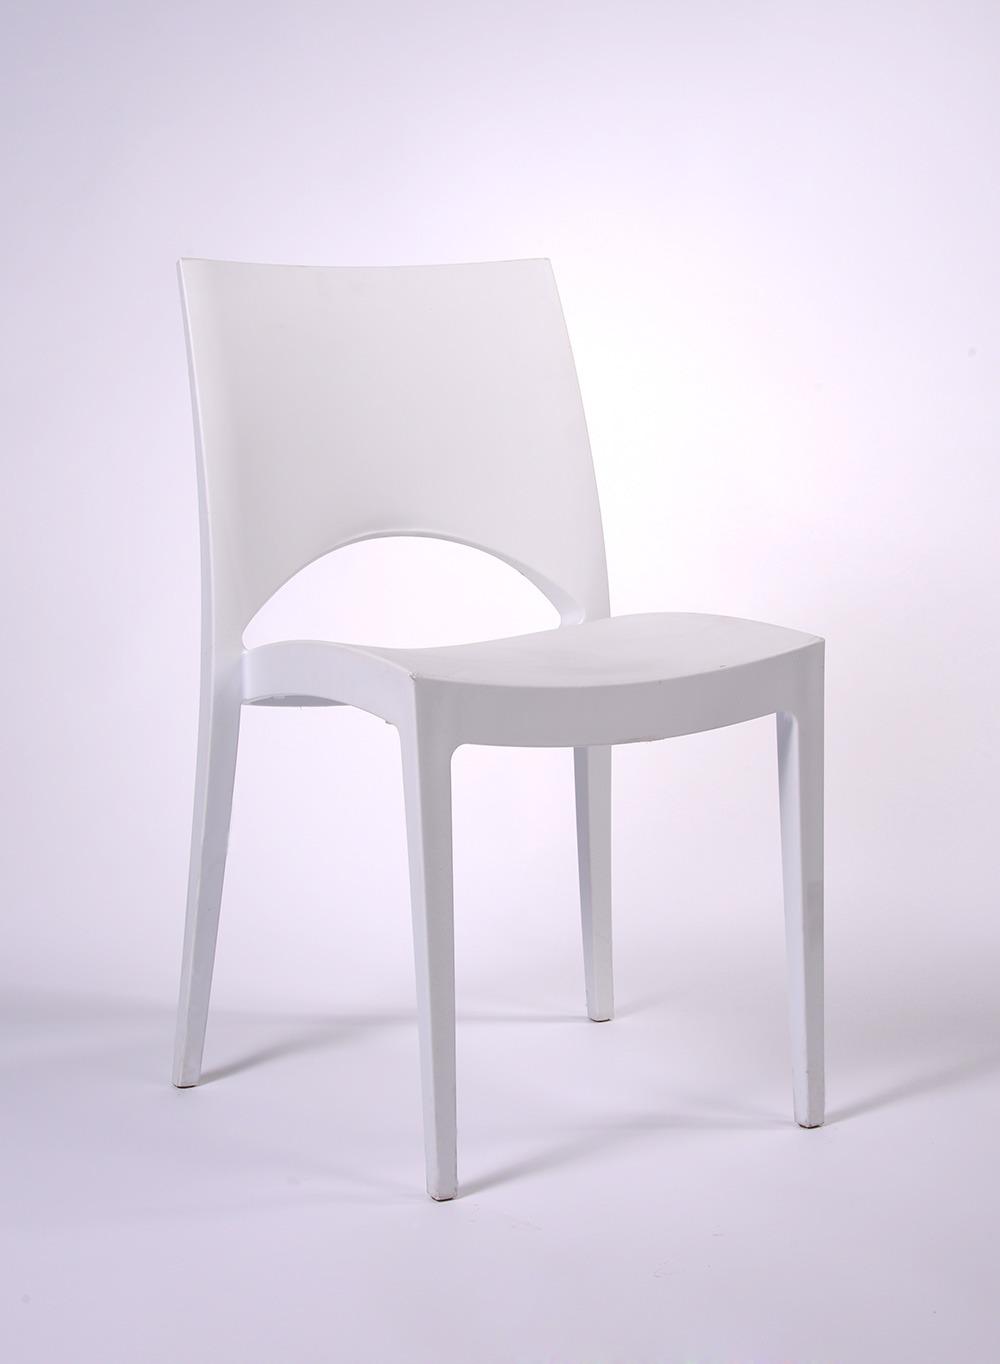 chaise paris blanche en polypropyl ne durand location. Black Bedroom Furniture Sets. Home Design Ideas